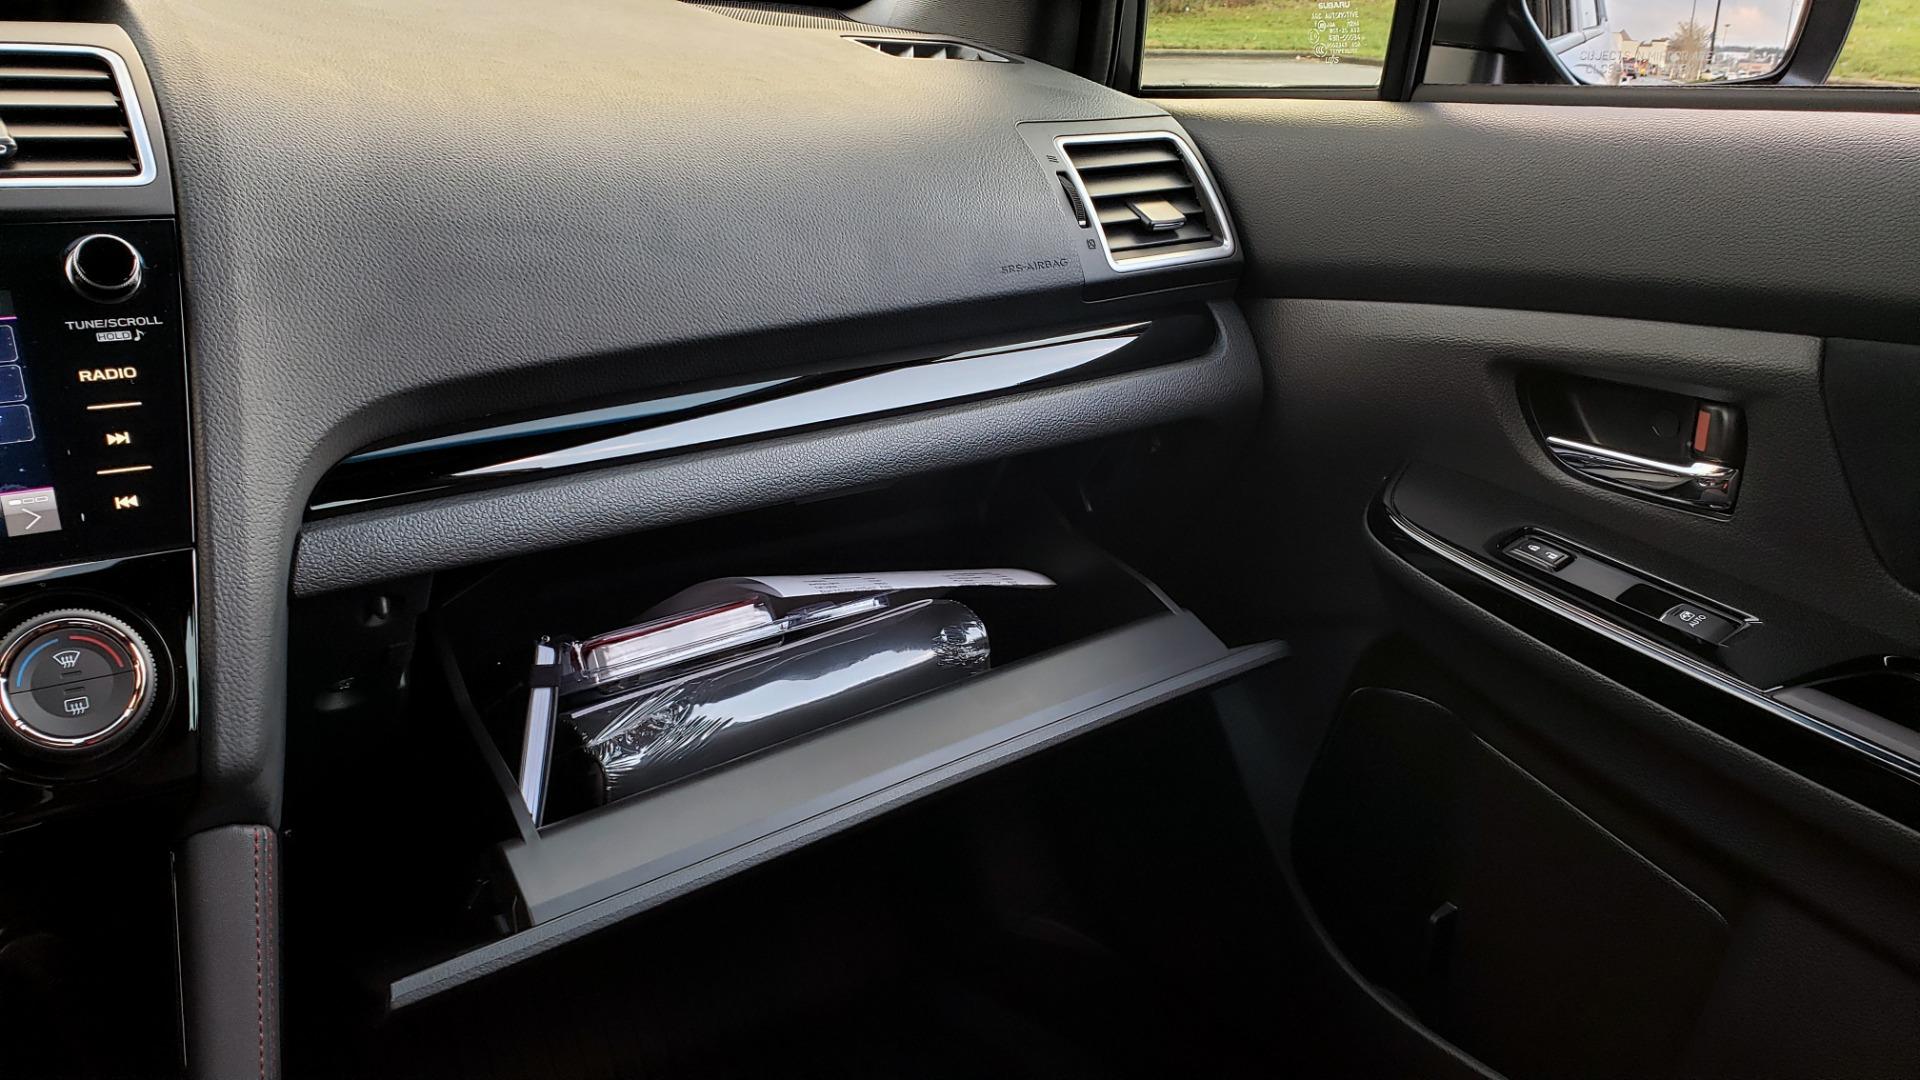 Used 2020 Subaru WRX STI 2.5L TURBO / 6-SPEED MANUAL / RECARO SEATS / REARVIEW for sale Sold at Formula Imports in Charlotte NC 28227 60